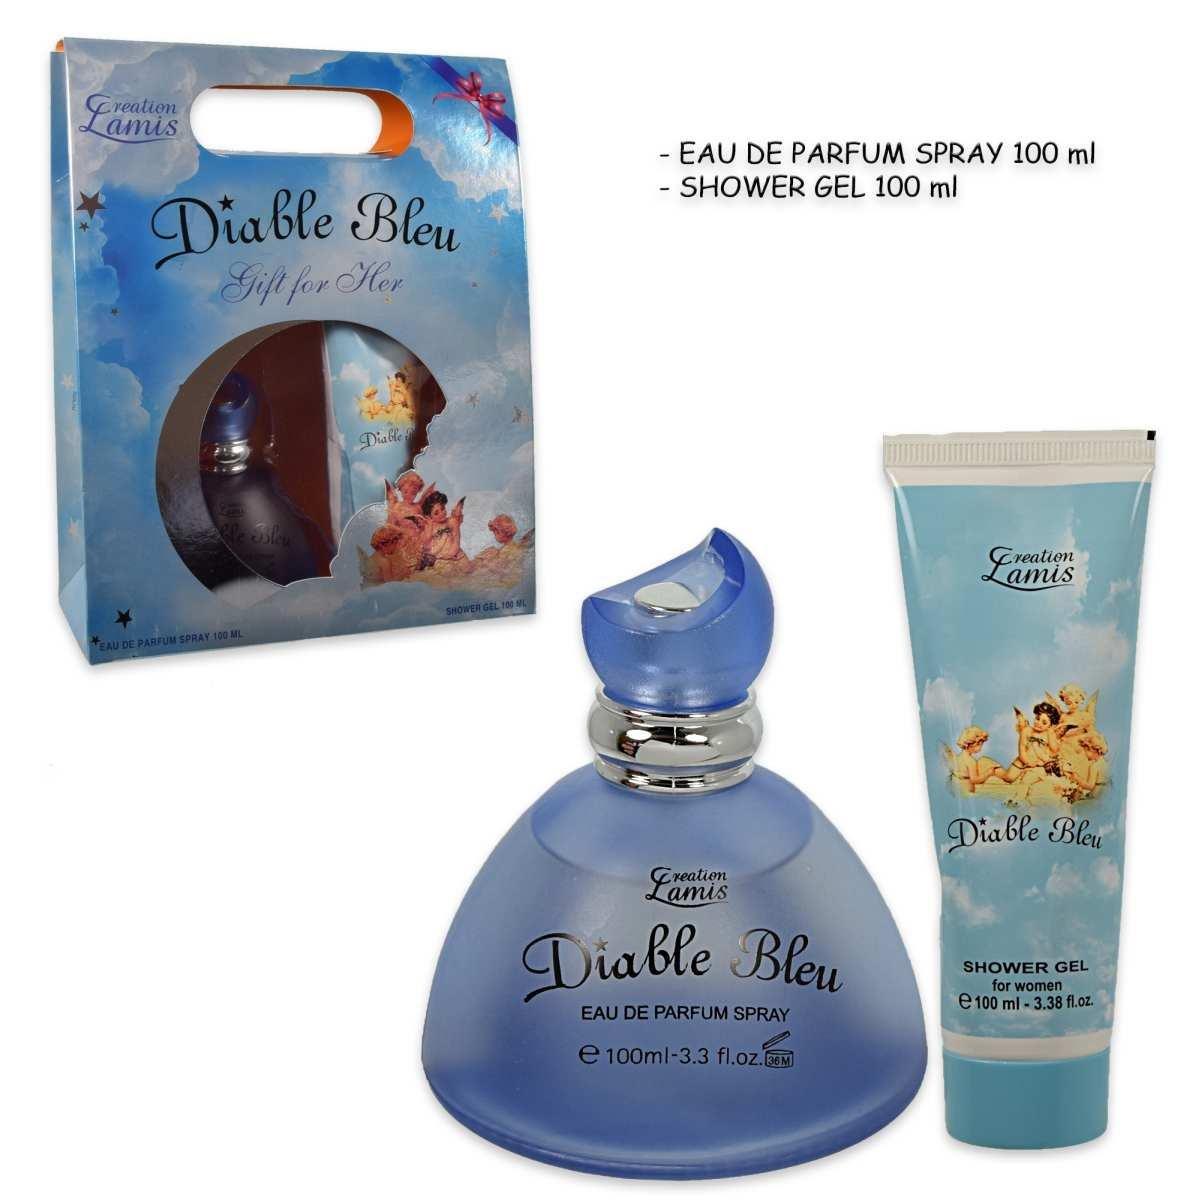 Parfum Bewertungen: Lamis Diable Bleu Women Eau de Parfüm